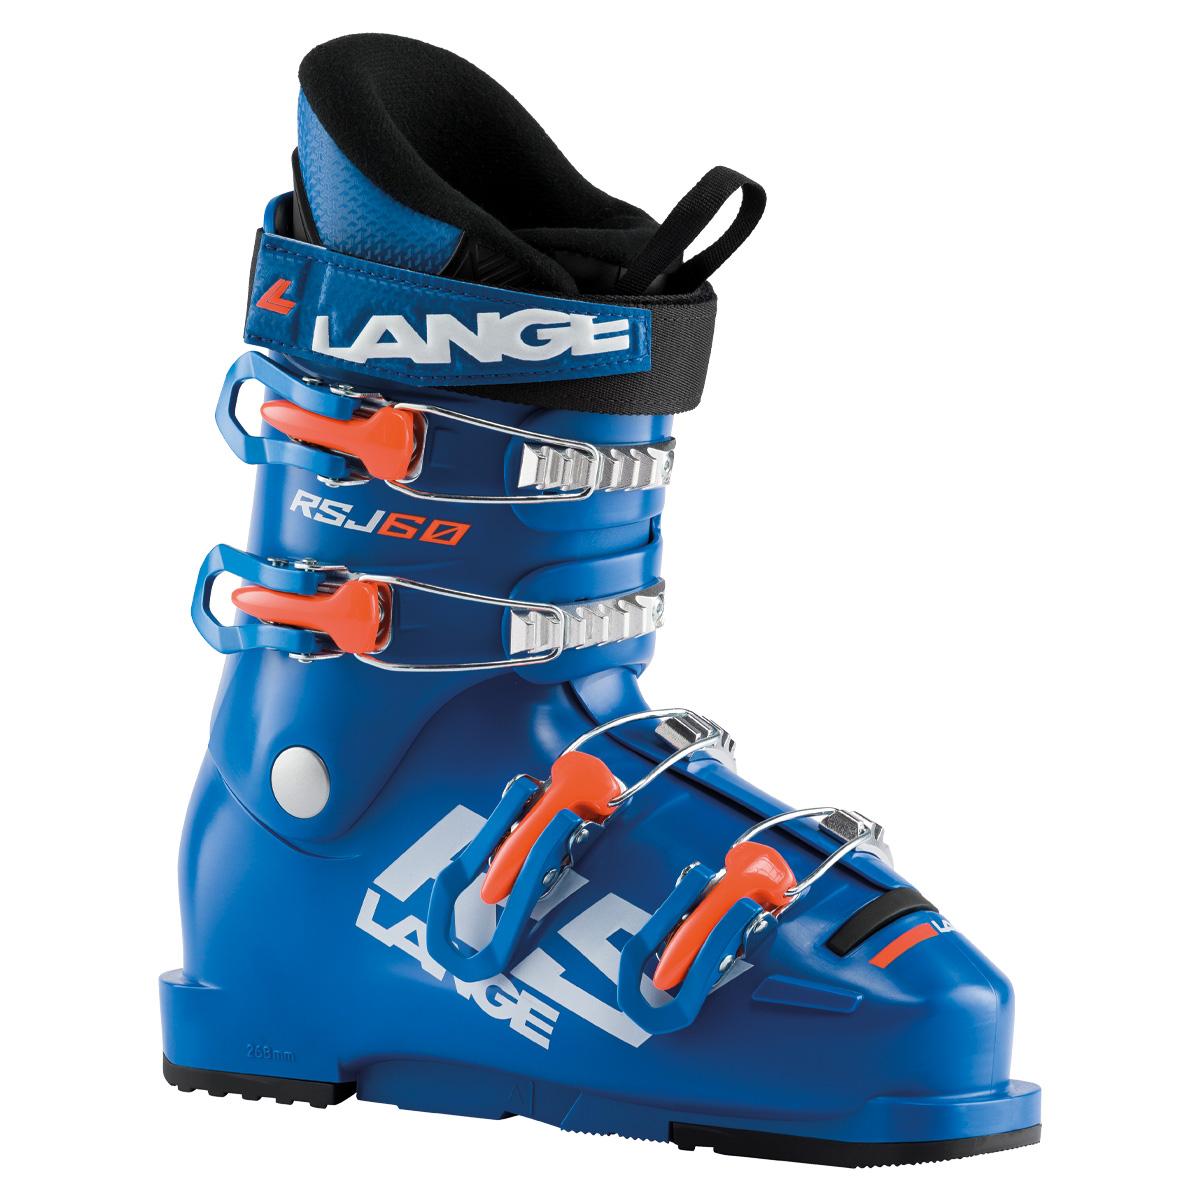 Scarponi Sci Lange RSJ 60 (Colore: Blu arancione, Taglia: 20.5)